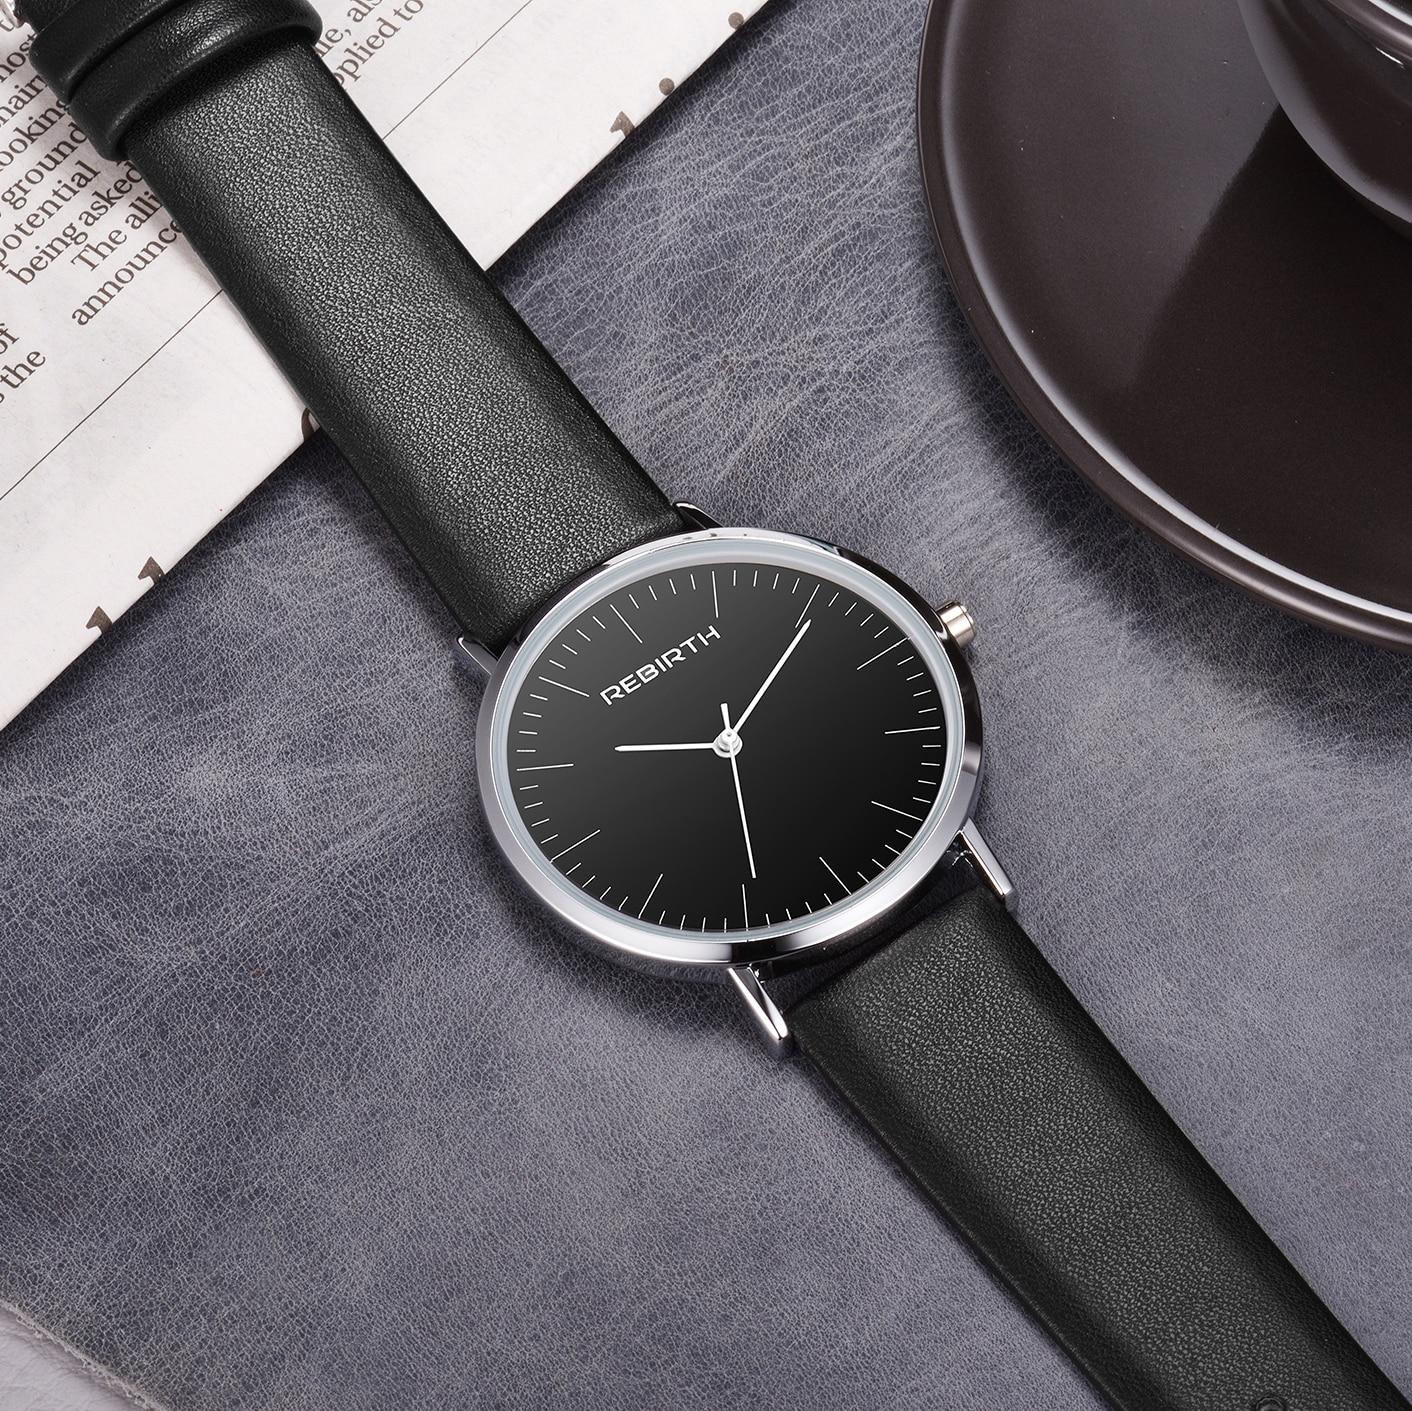 2018 Fashion Quality Wrist Watch Men Women Watches Top Brand Famous Quartz Watch Male Female Clock Relogio Feminino Montre Femme